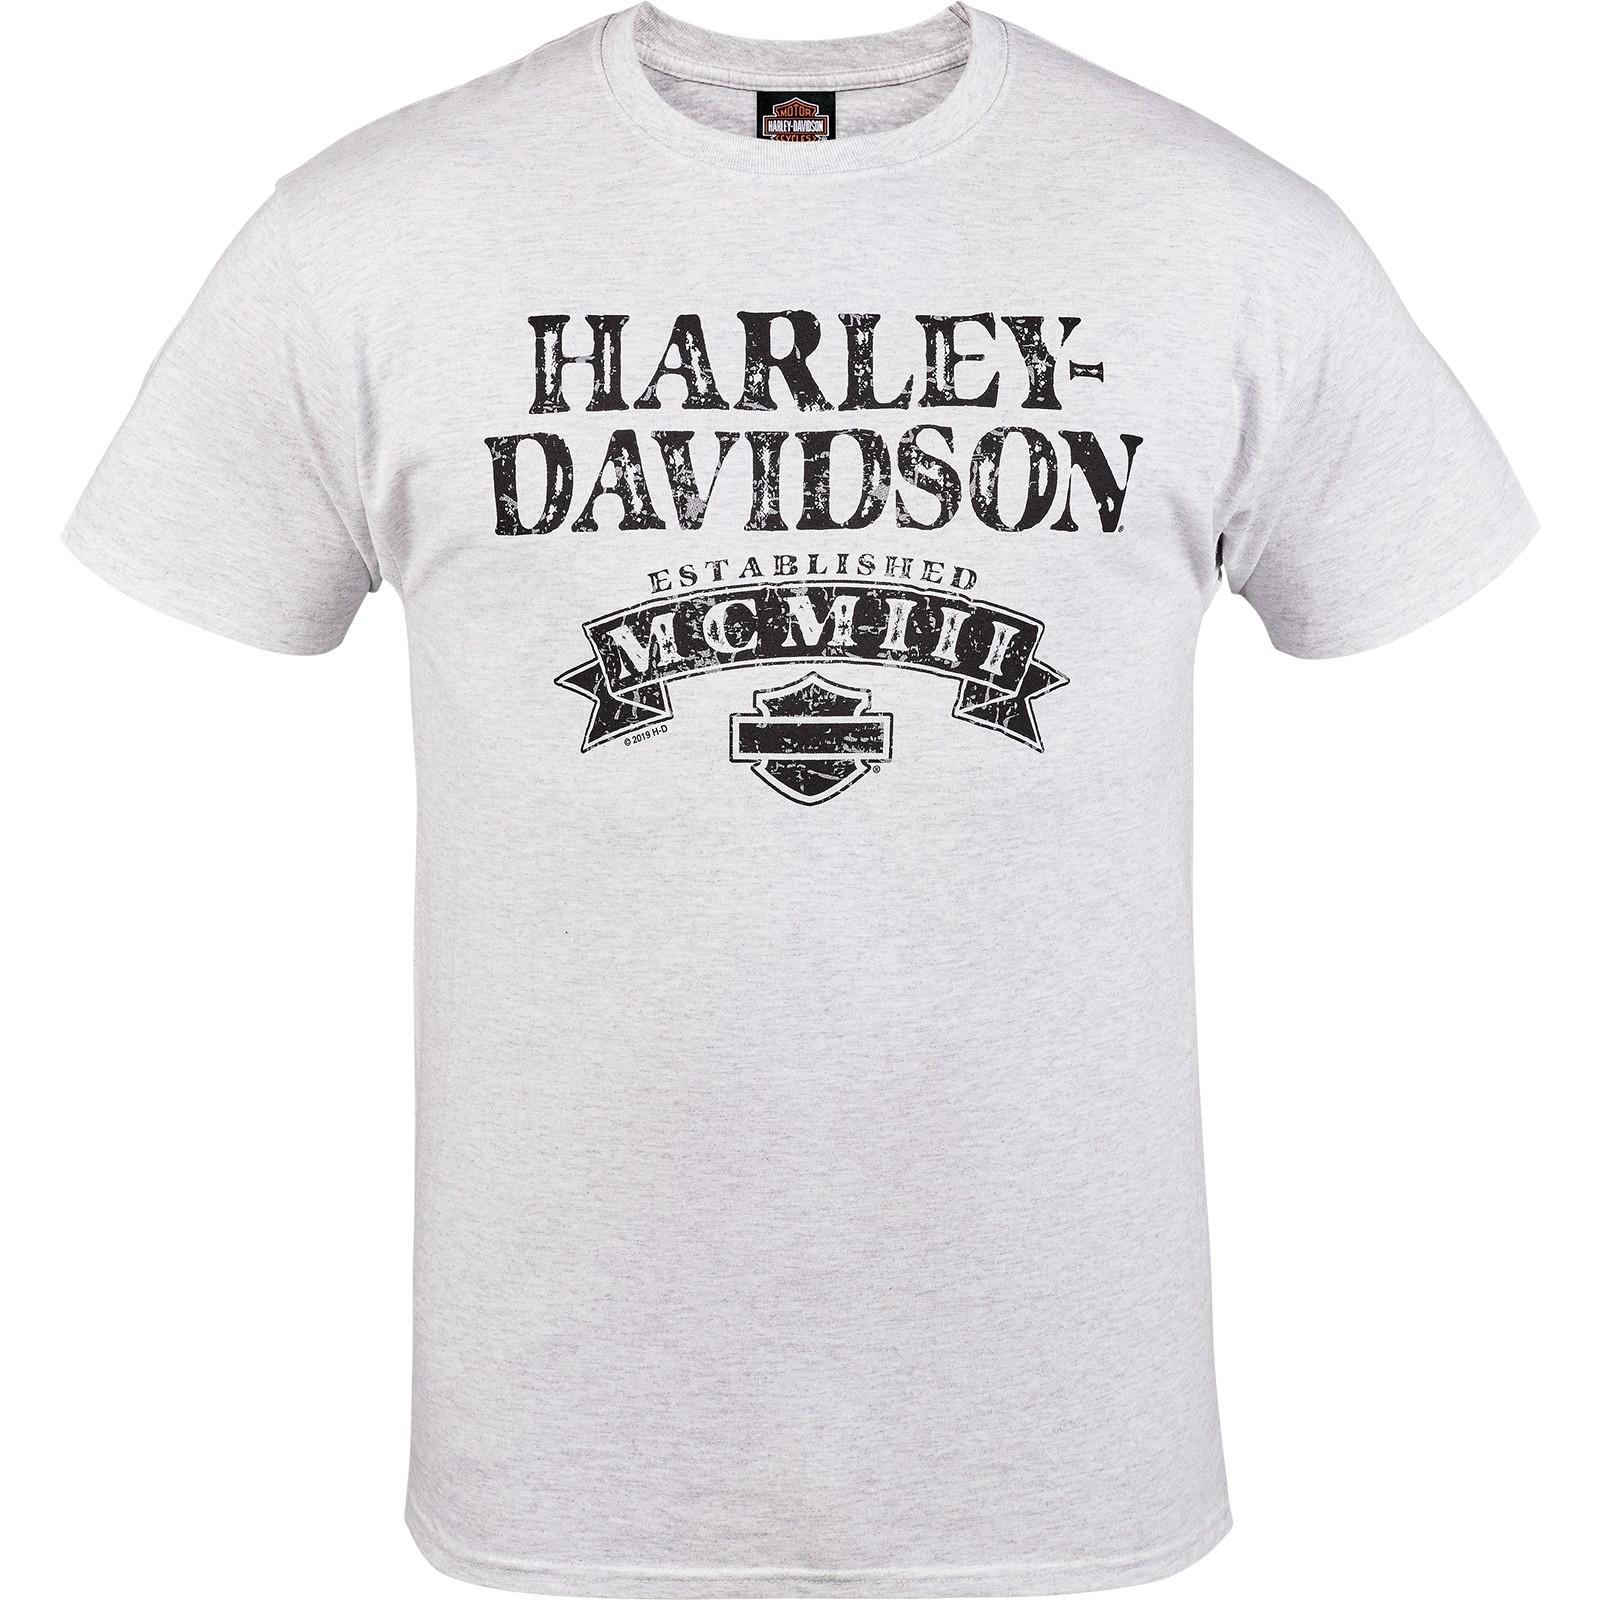 Harley-Davidson Military - Men's Ash Short-Sleeve Graphic T-Shirt - Aviano Air Base | Numeral Name